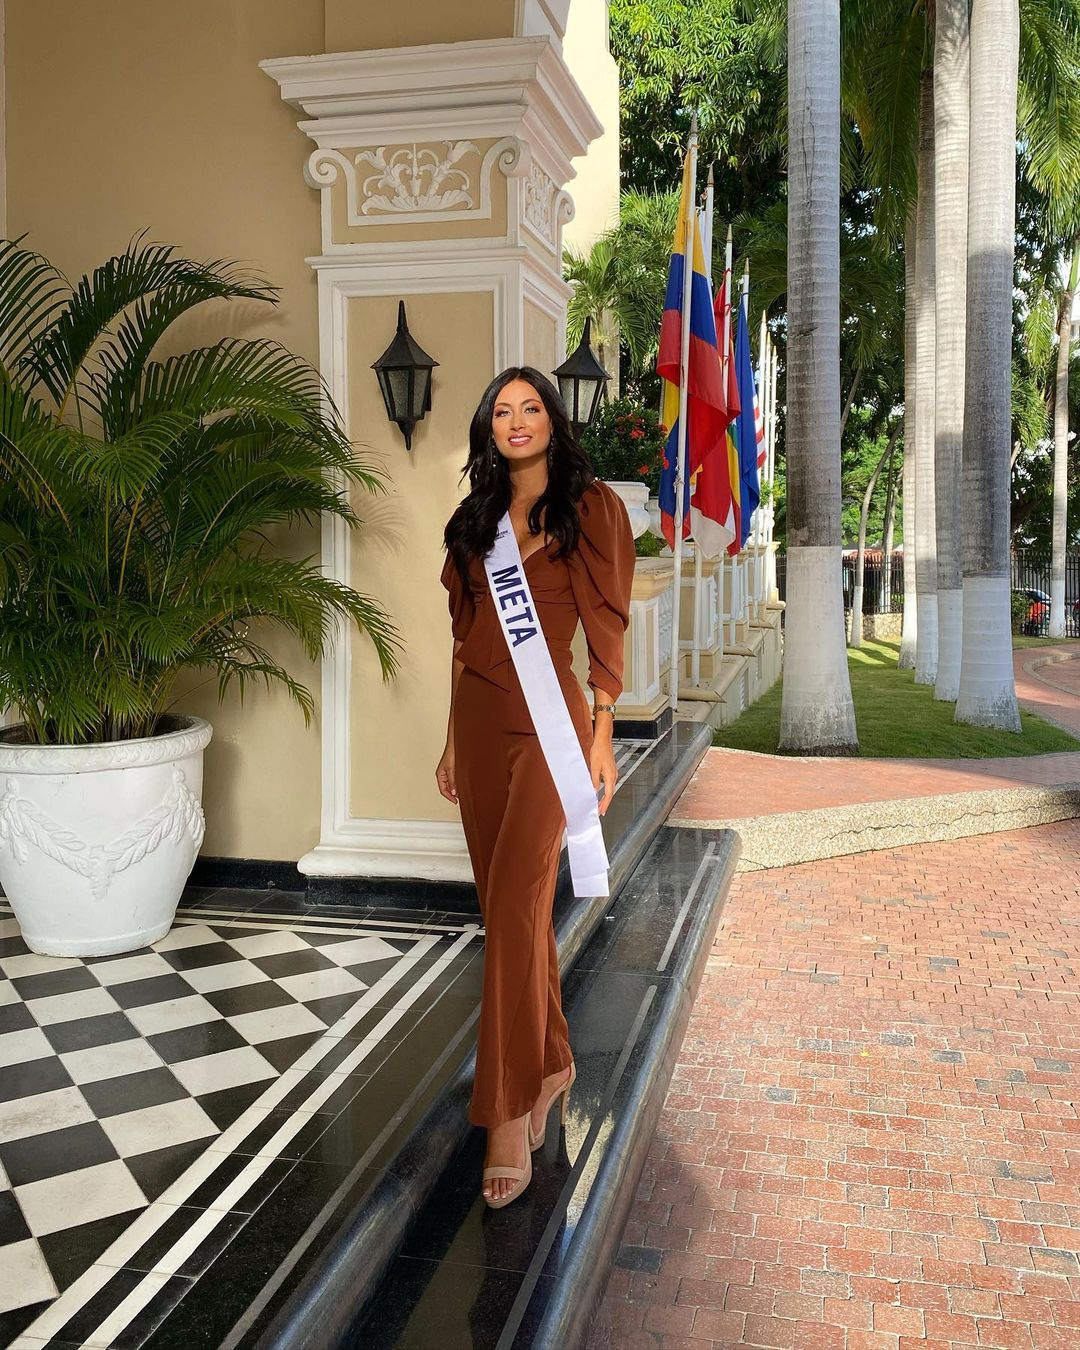 juliana franco, top 16 de miss colombia universo 2020/miss earth water 2017. - Página 21 Julifr24